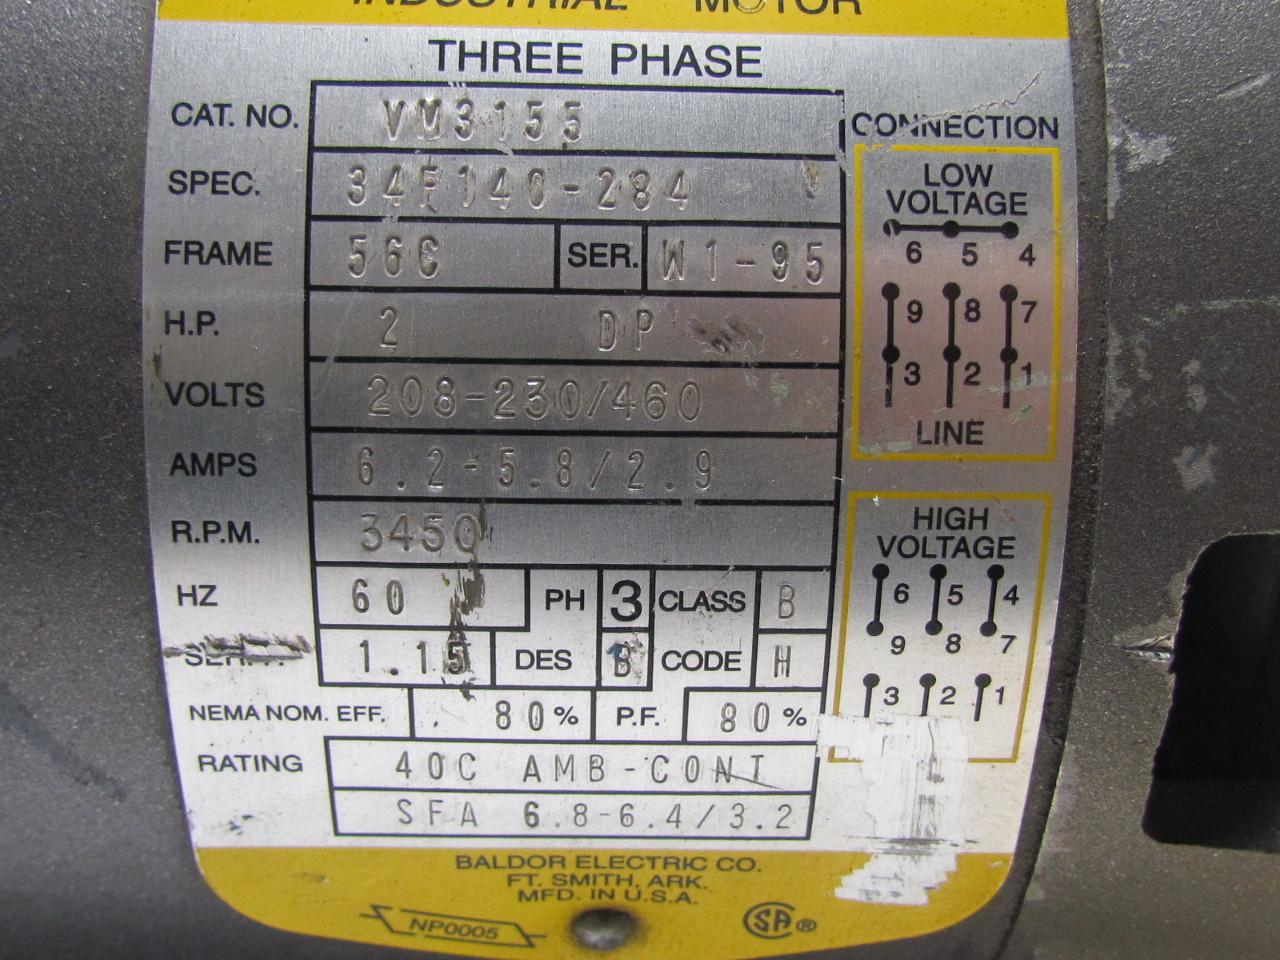 460 volt 3 phase wiring 208 230 3 phase wiring diagram wiring diagram  208 230 3 phase wiring diagram wiring